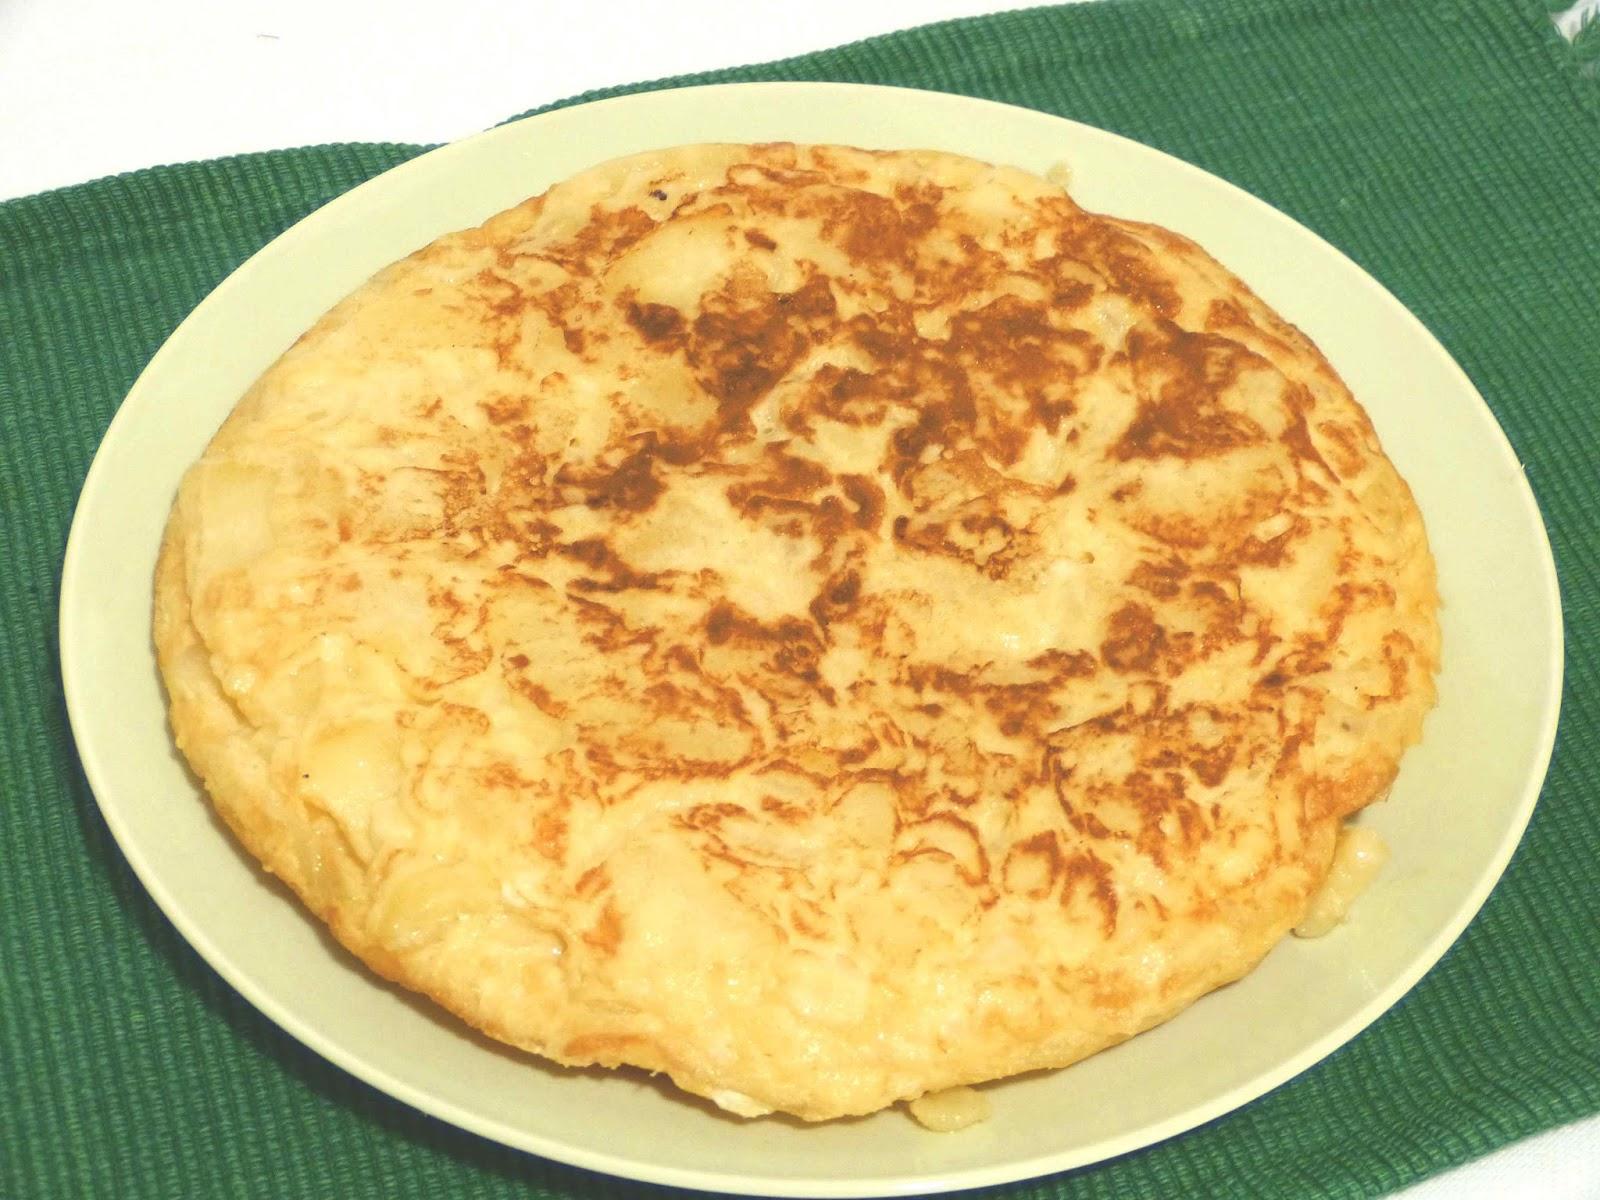 Tortilla de patatas o tortilla espa ola en microondas - Tortilla en el microondas ...